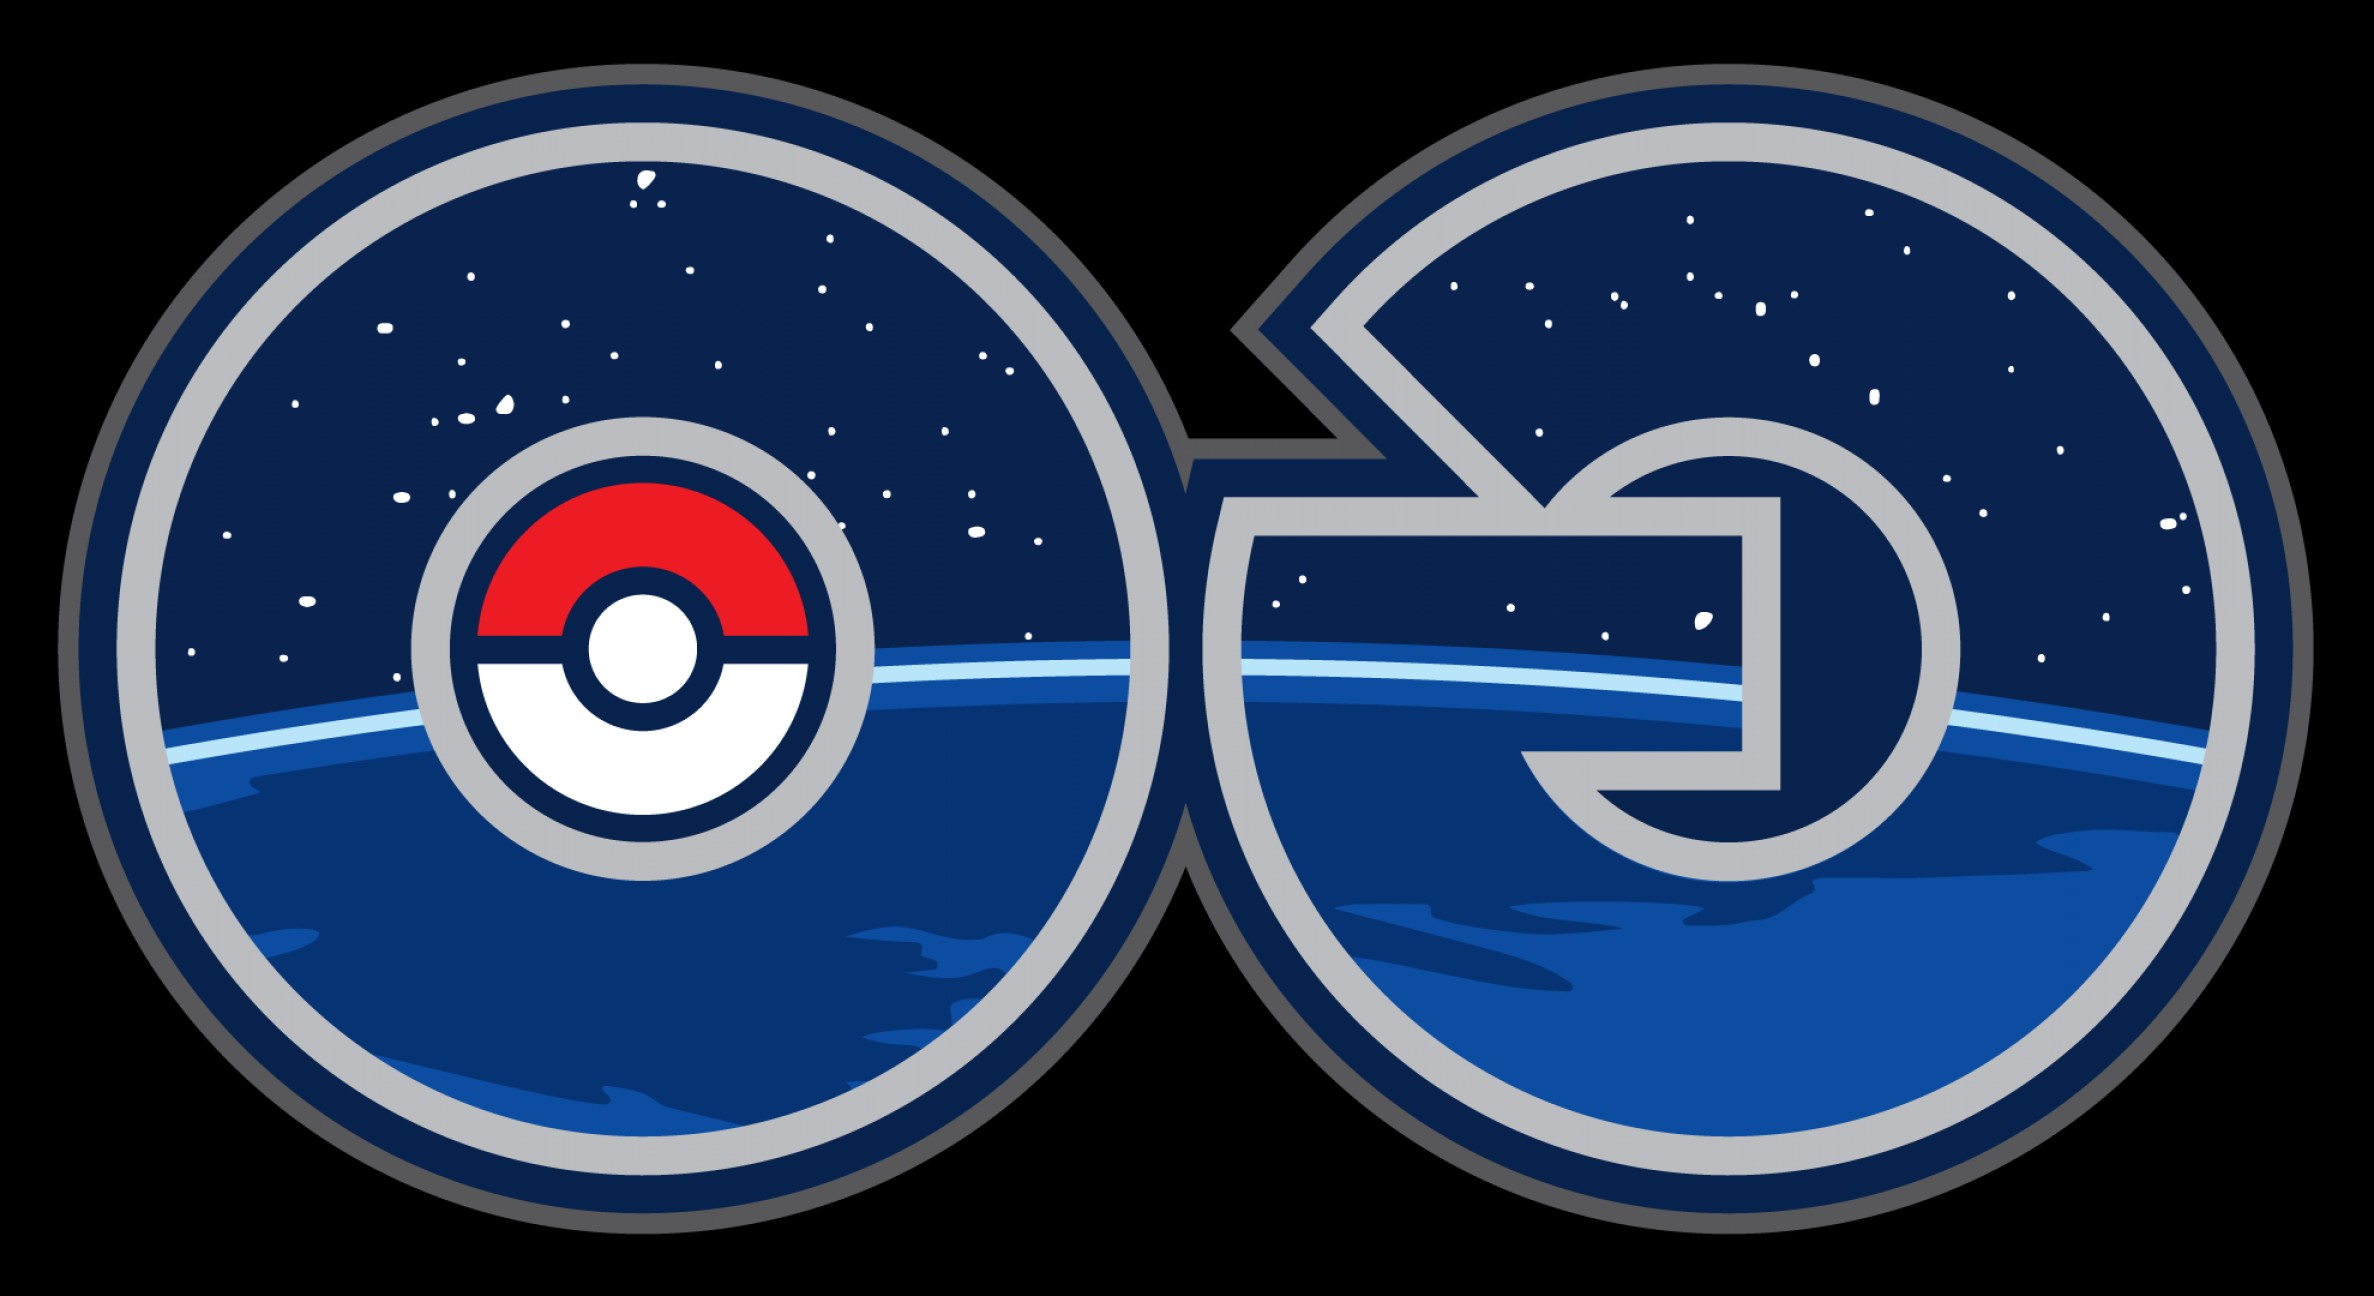 2374x1296 Pokemon Go Logo Vector Png Geekchicpro